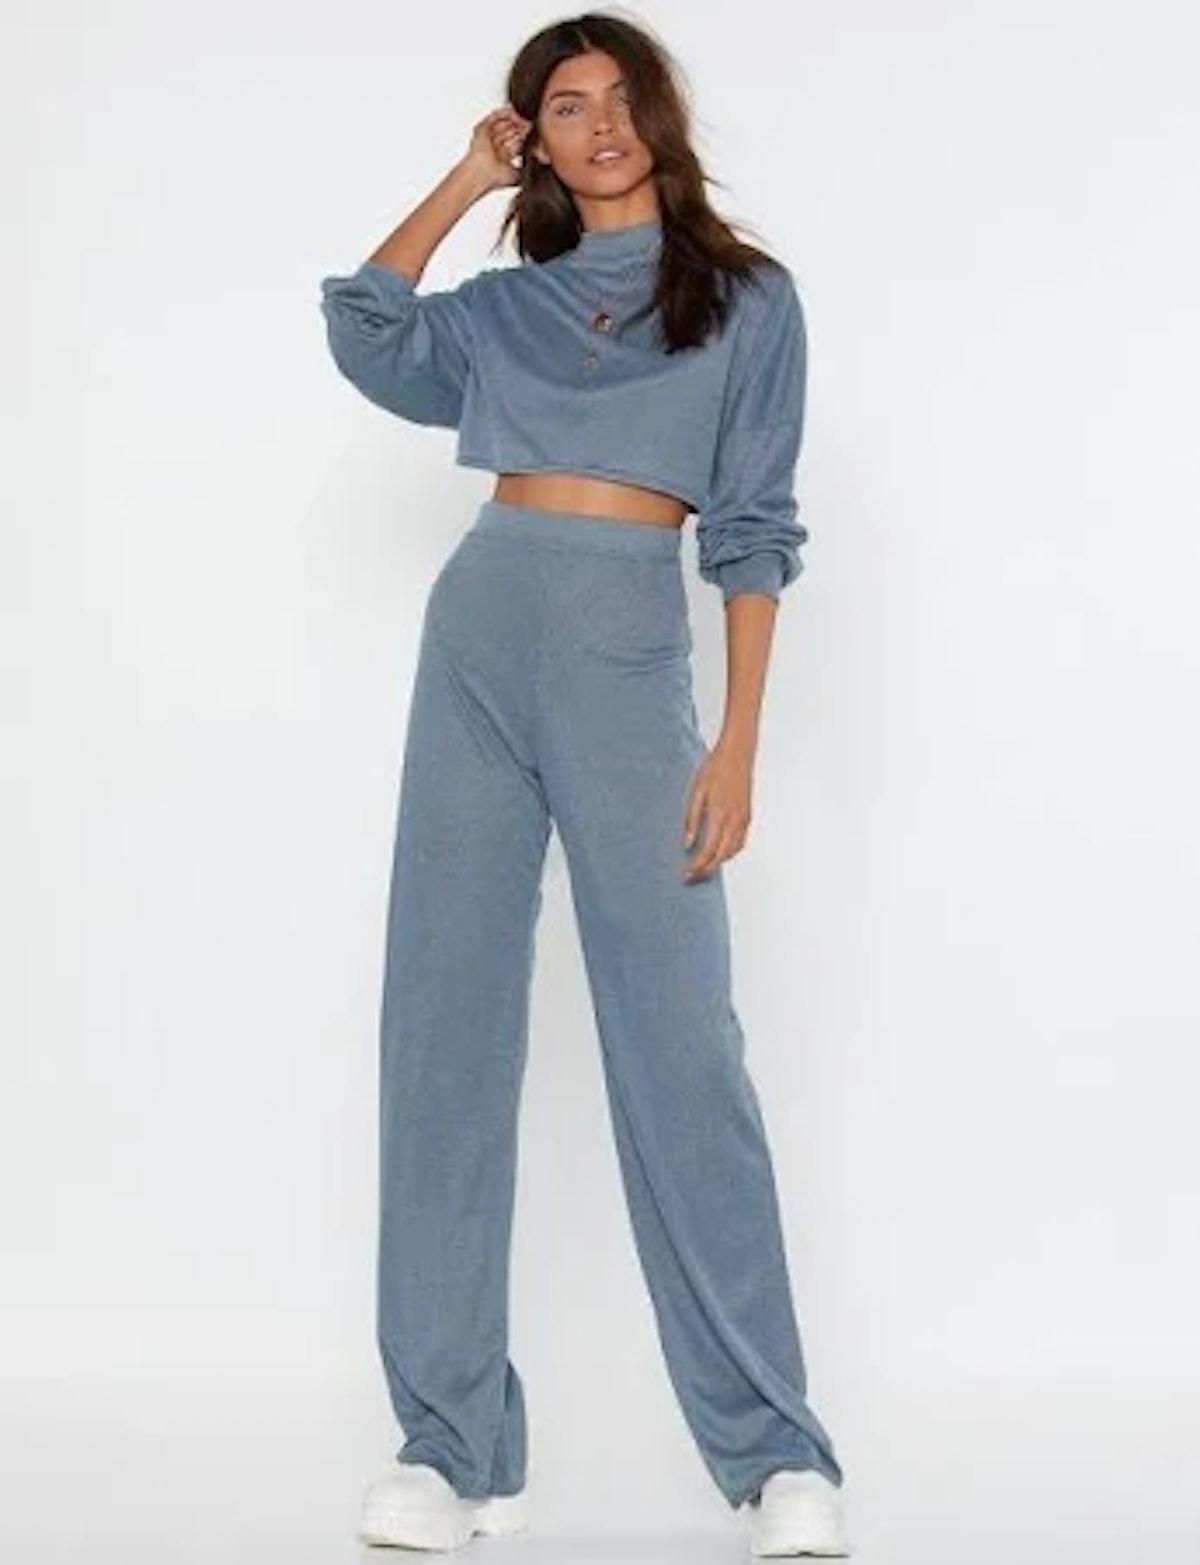 Nasty Gal Back to Basics Crop Top and Pants Lounge Set